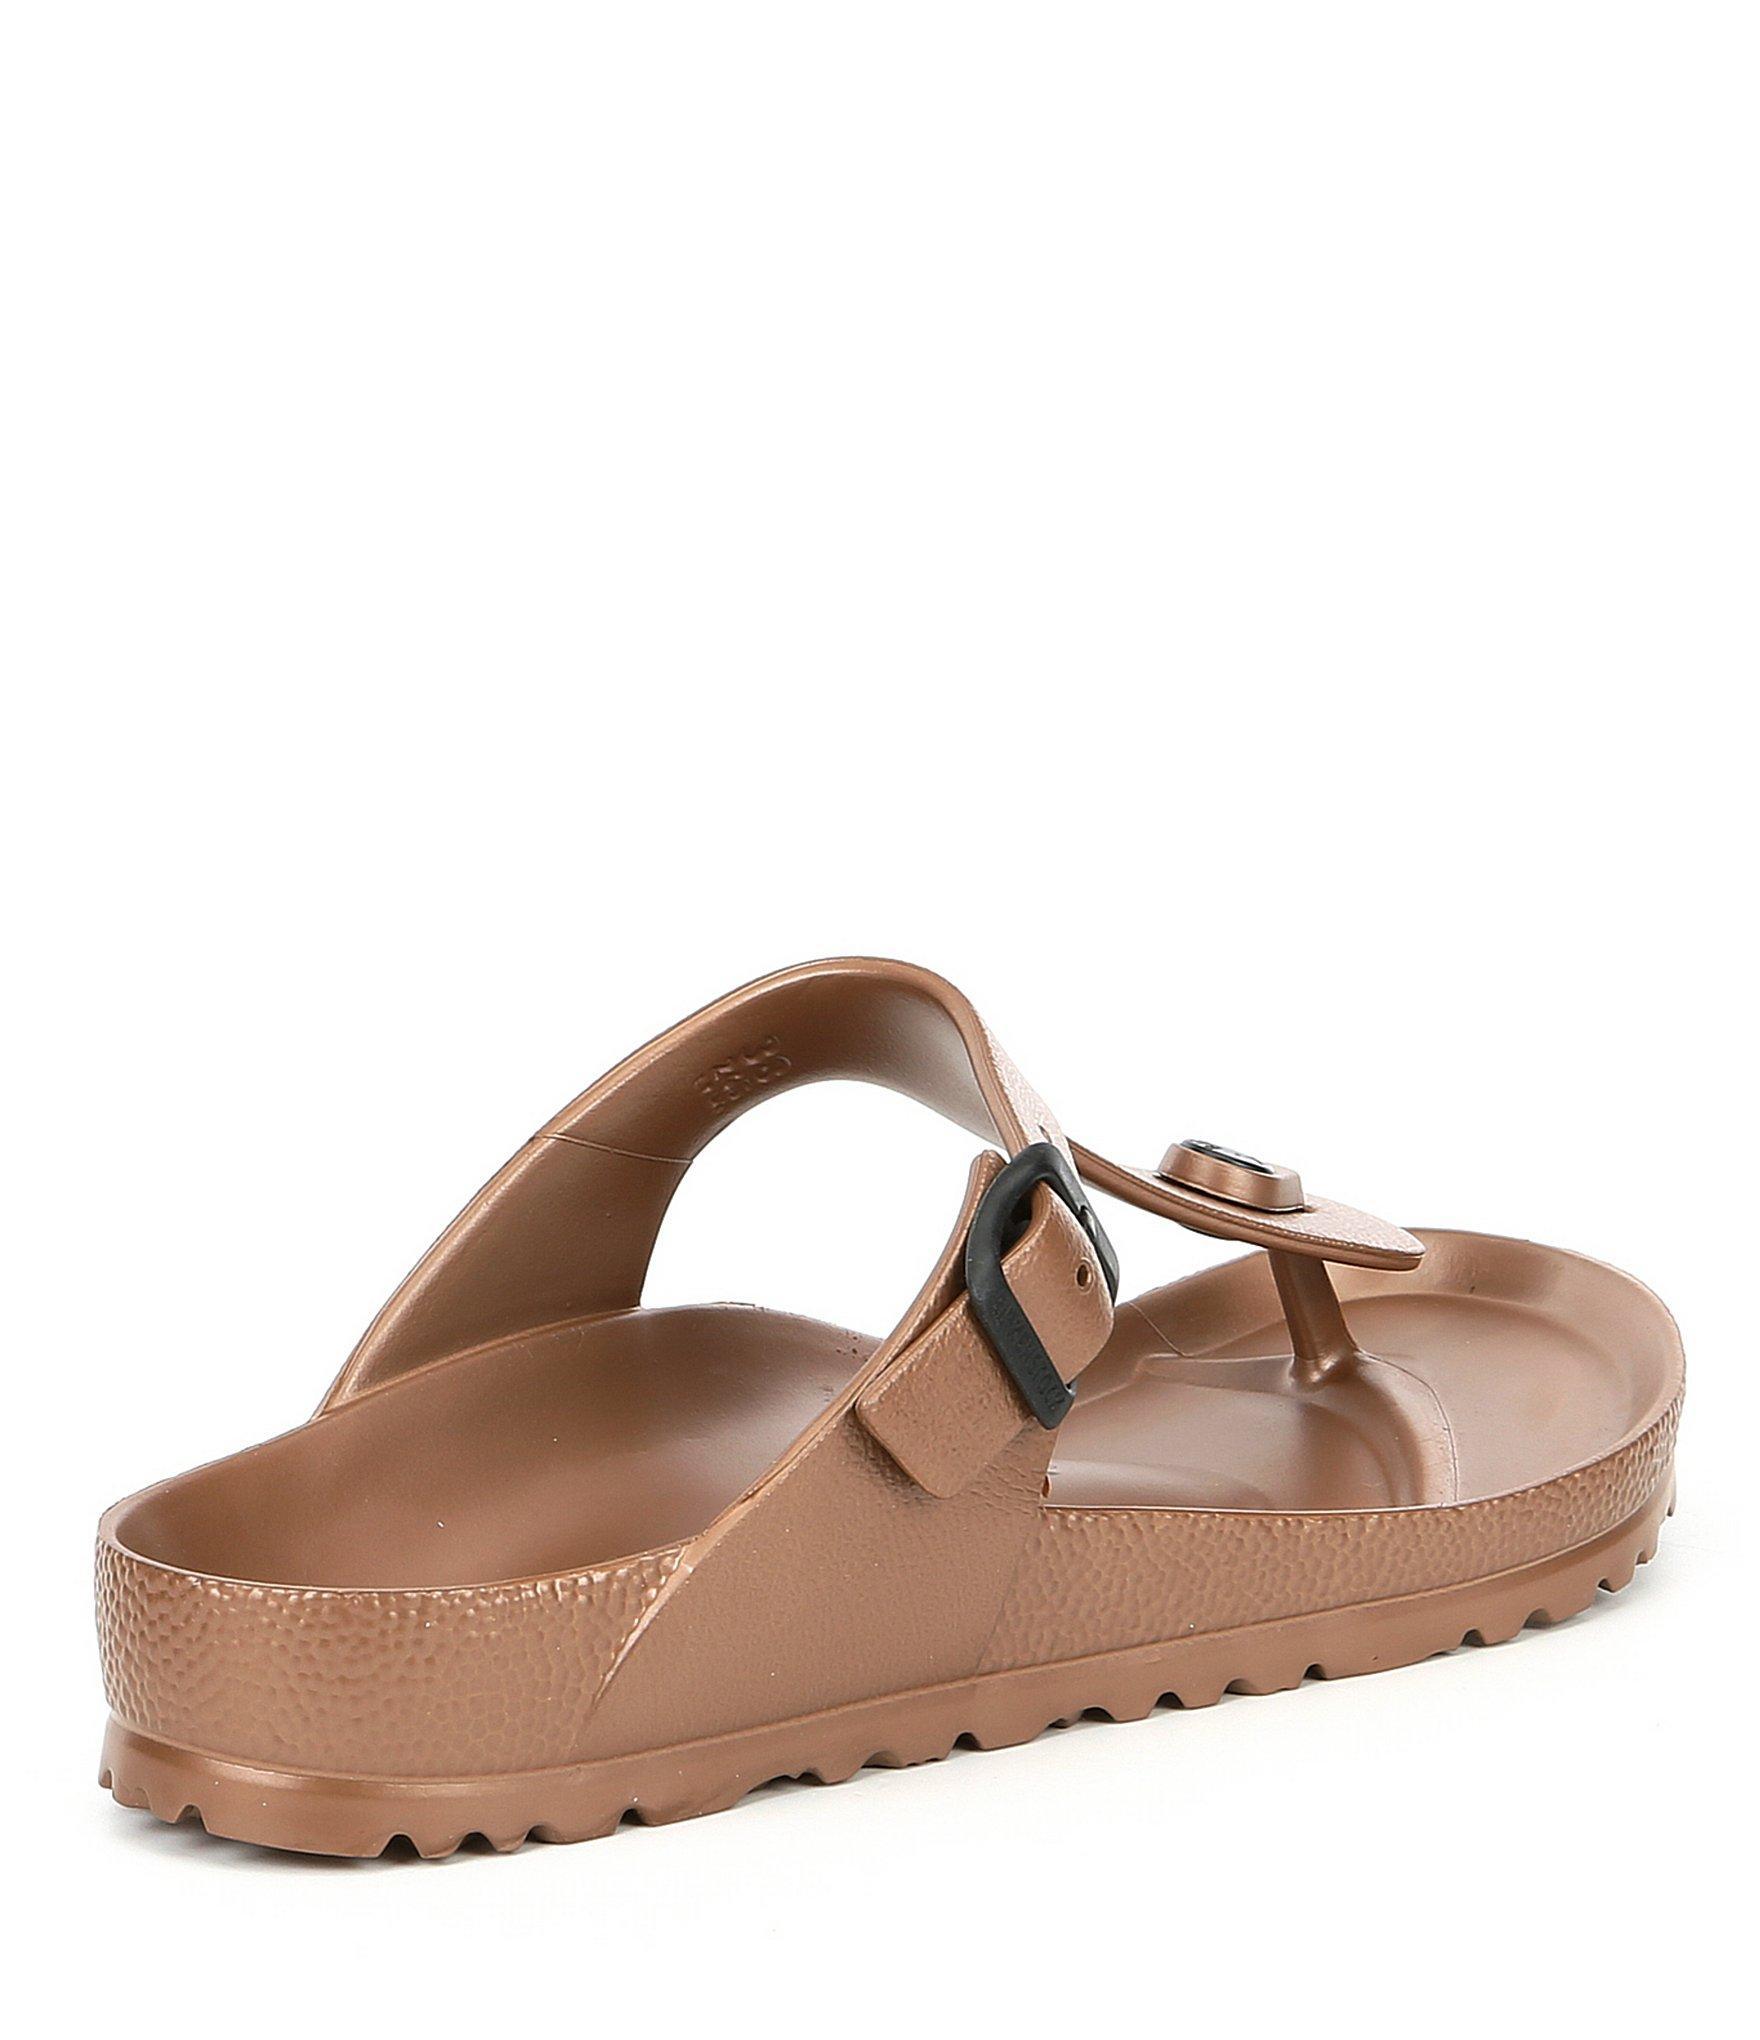 78c90261a67c Birkenstock - Brown Women s Gizeh Eva Adjustable Strap Thong Sandals -  Lyst. View fullscreen